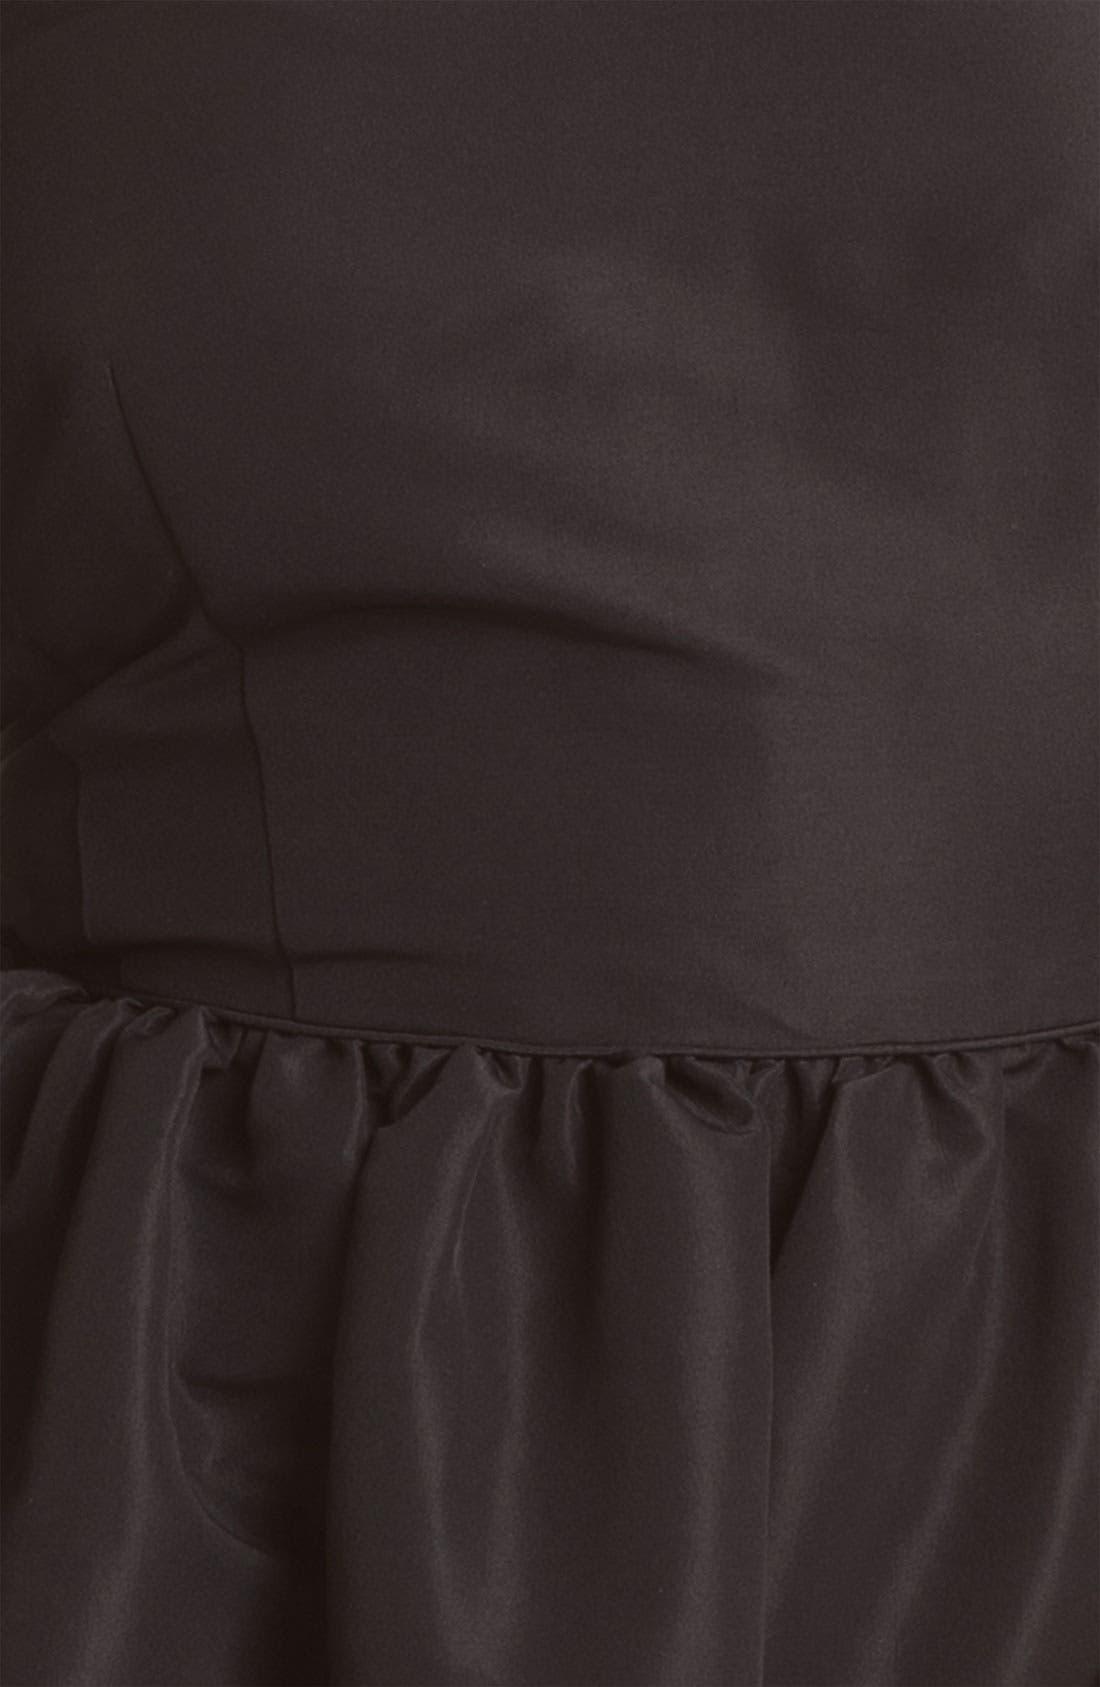 Alternate Image 3  - Original Frenchi Bubble Strapless Dress (Juniors)